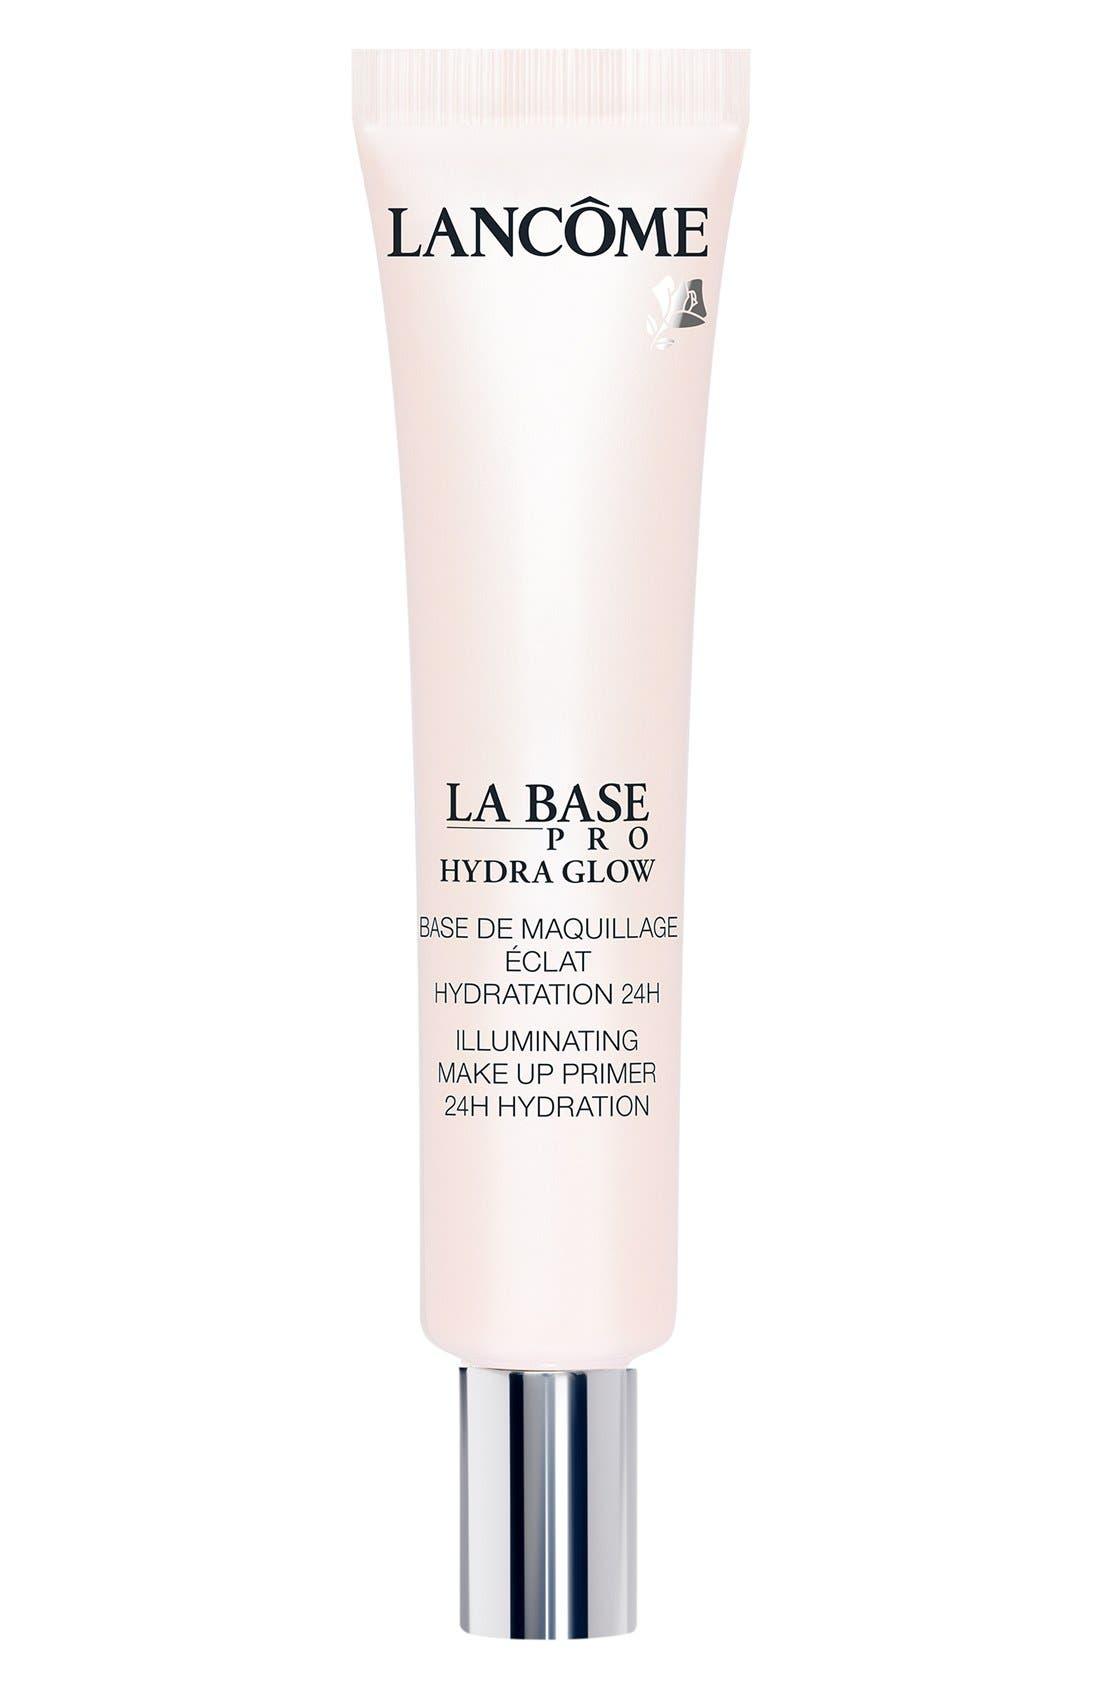 La Base Pro - Hydra Glow Illuminating Makeup Primer 24-Hour Hydration,                         Main,                         color, 000